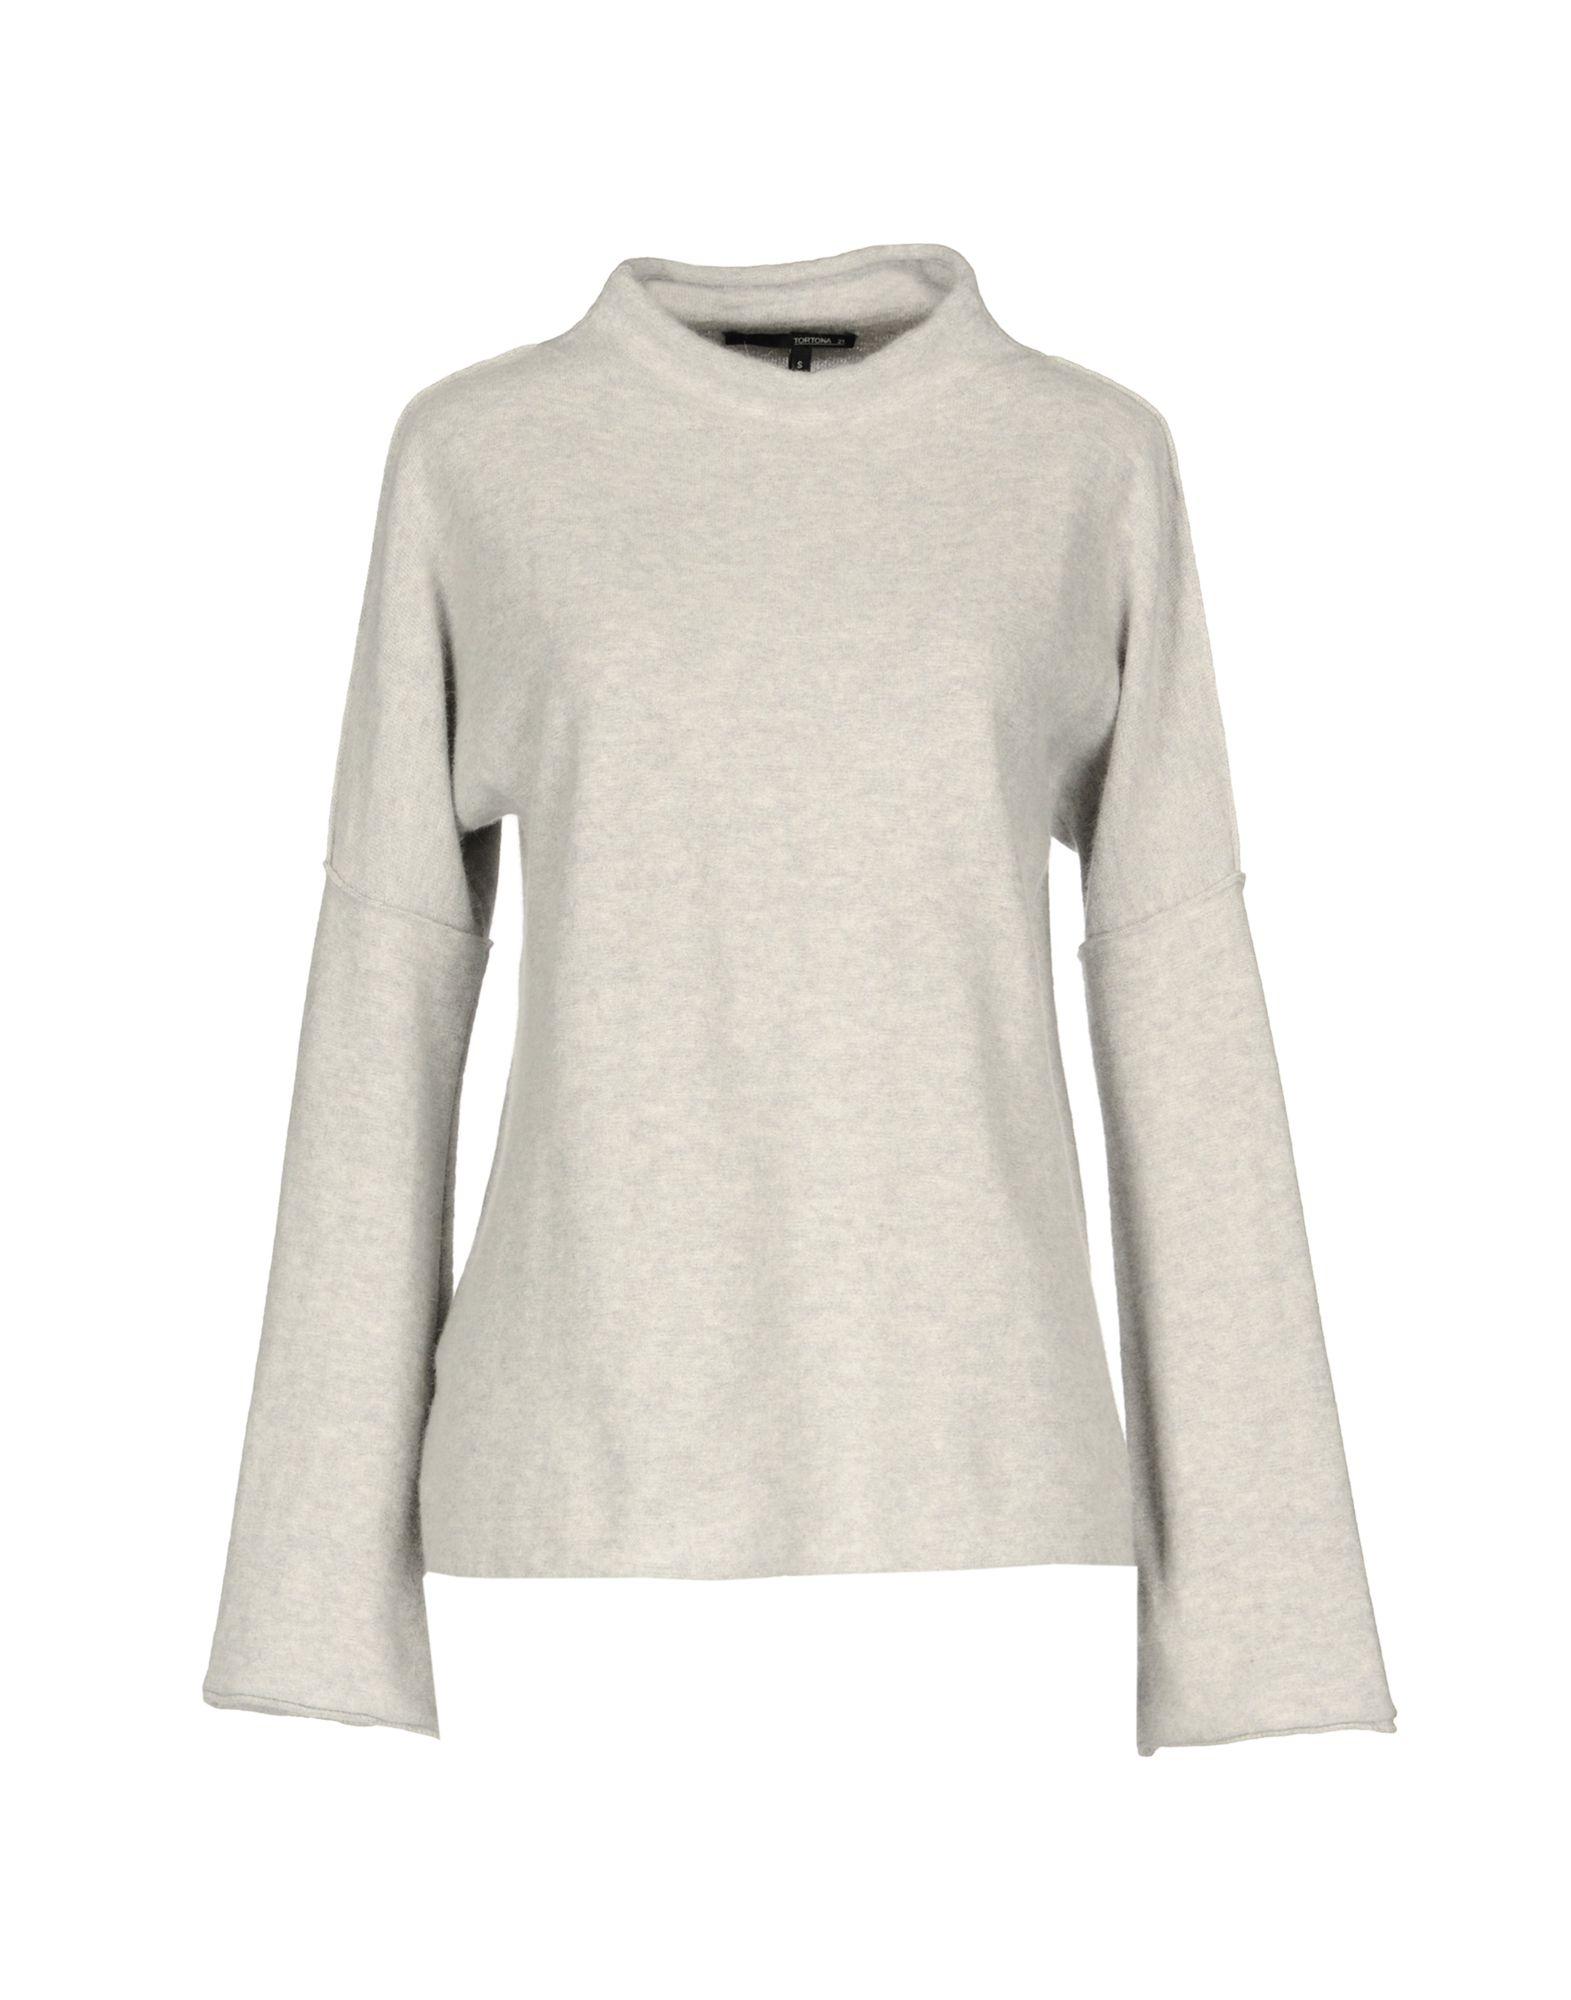 TORTONA 21 Damen Pullover Farbe Hellgrau Größe 5 - broschei